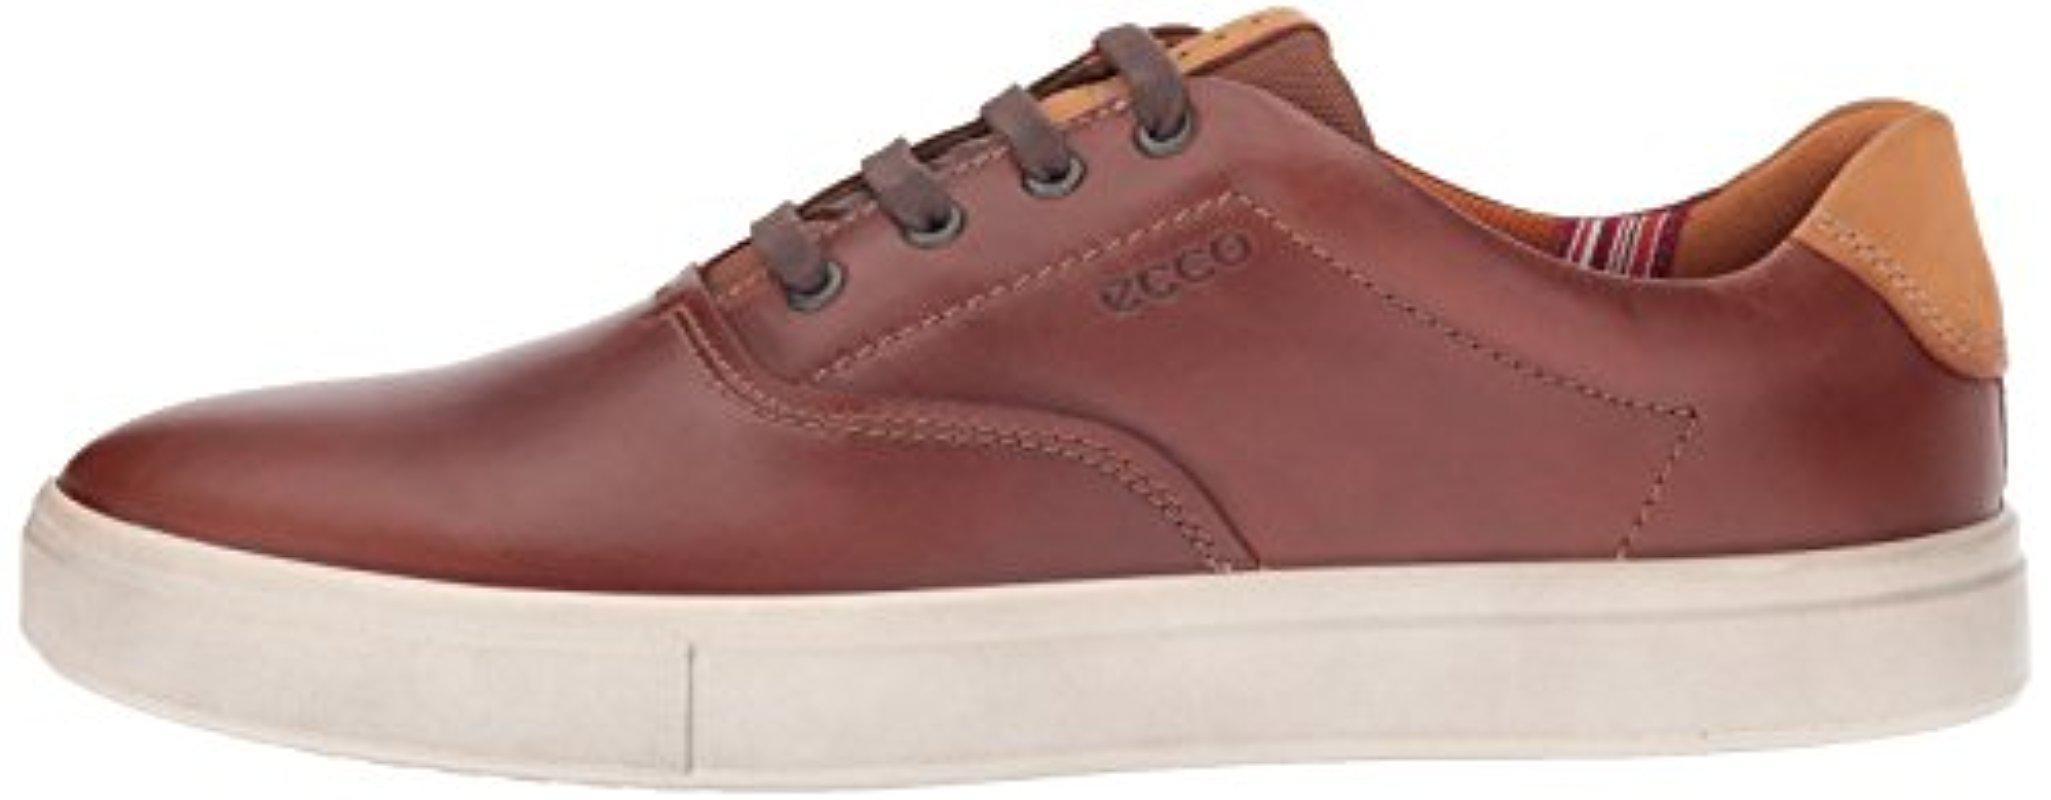 Ecco Leather Kyle Retro Fashion Sneaker